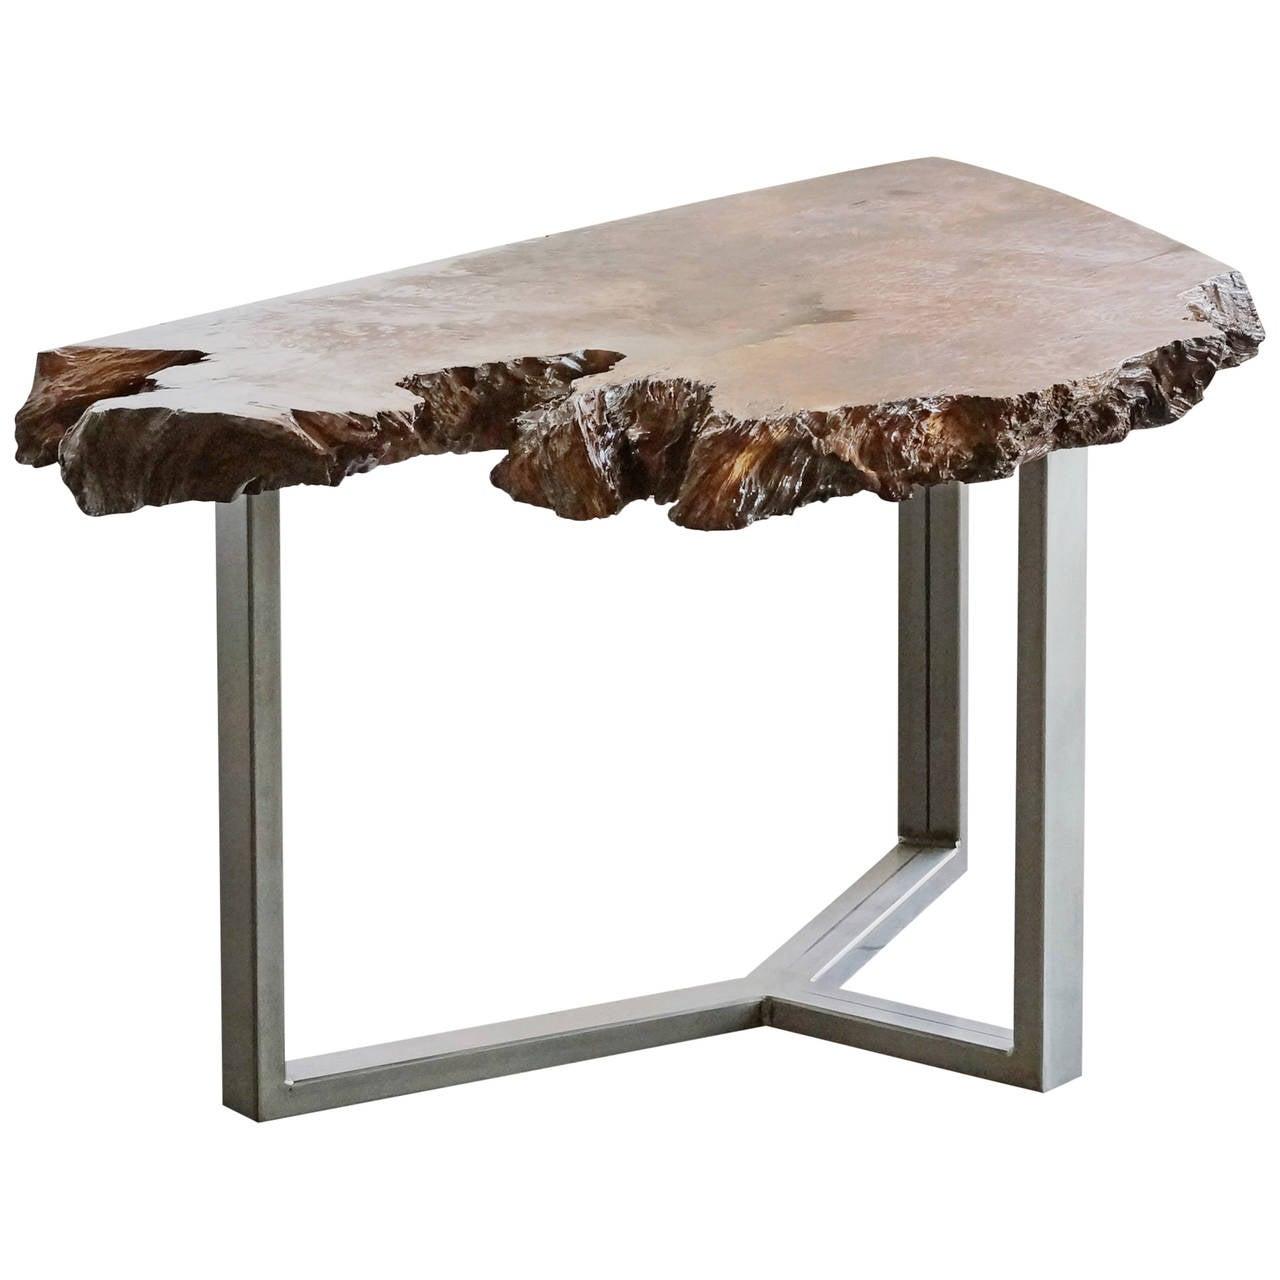 Modernist Redwood Burl Coffee Table At 1stdibs